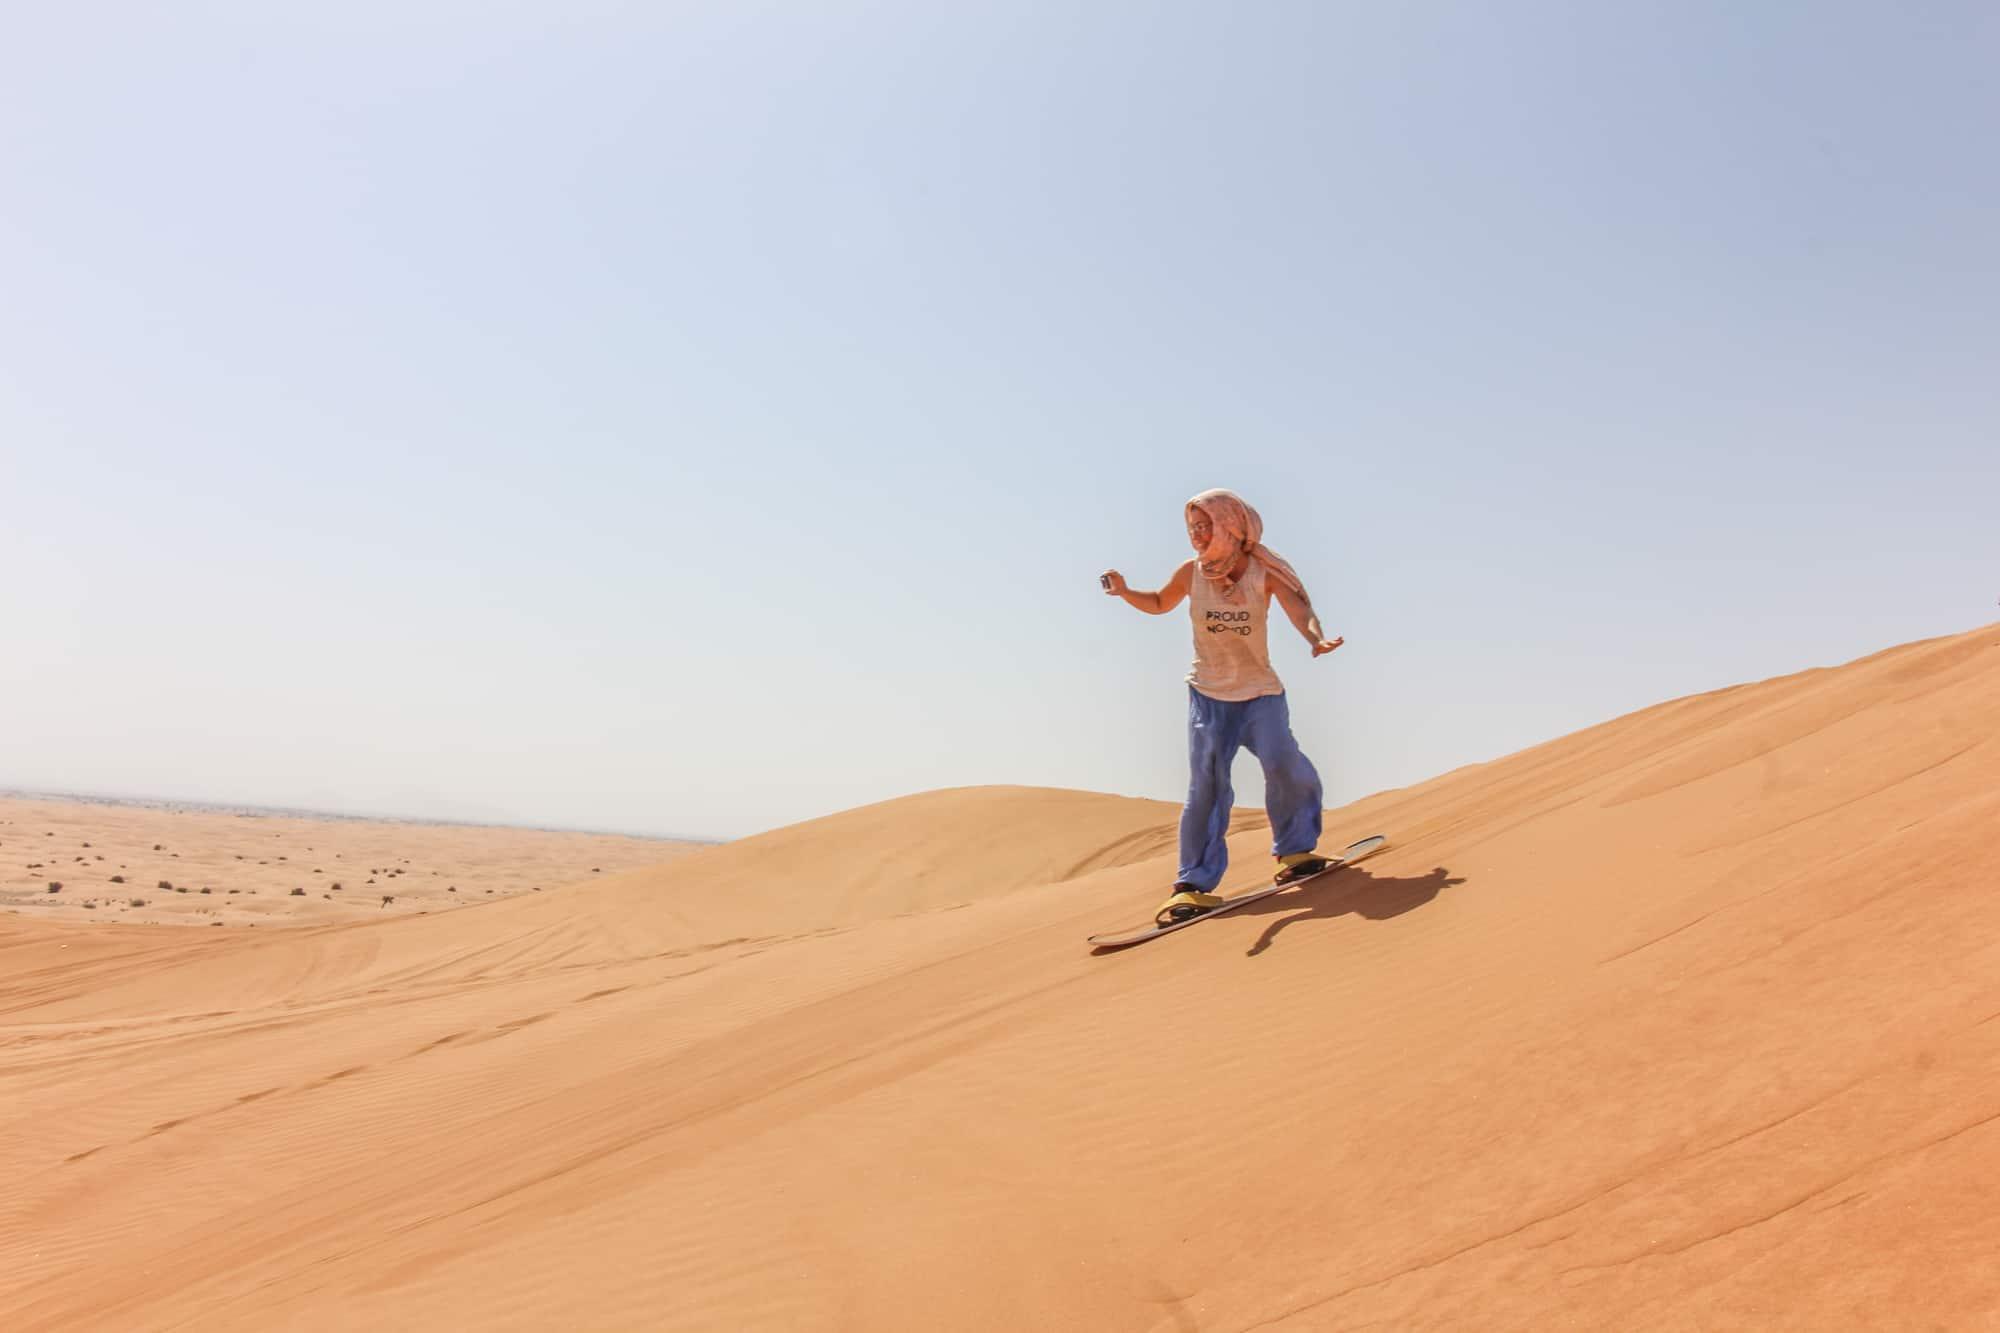 Dune Bashing und Sandboarding in Dubai – Nervenkitzel in den Emiraten